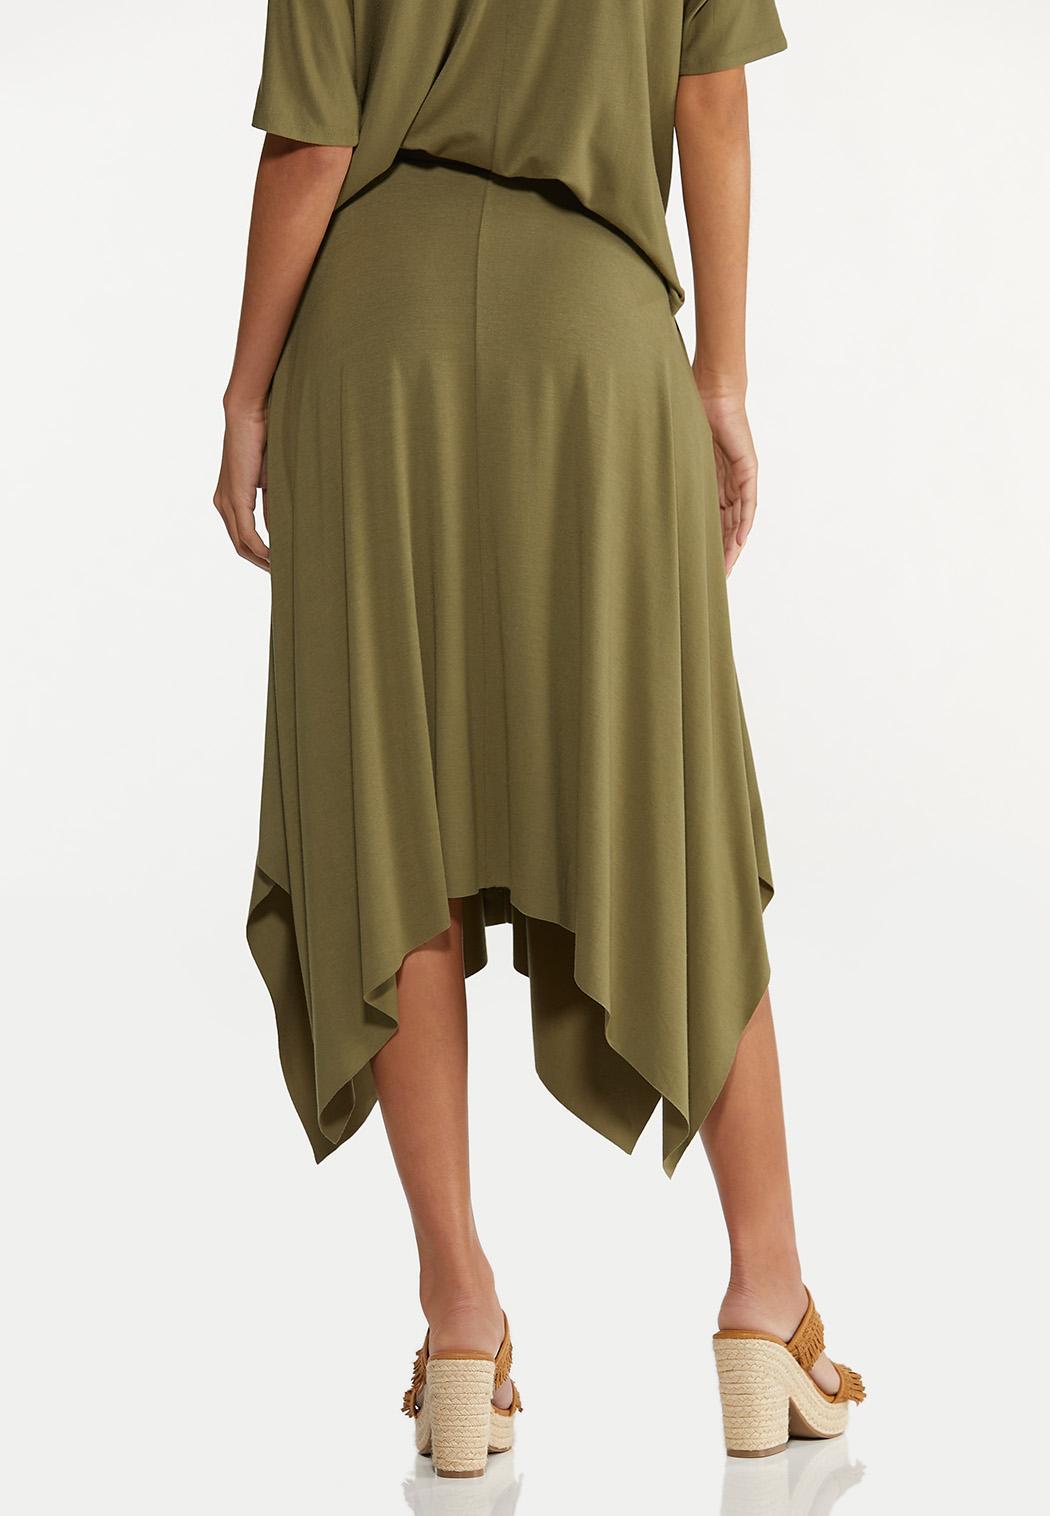 Plus Size Olive Hanky Hem Skirt (Item #44616552)